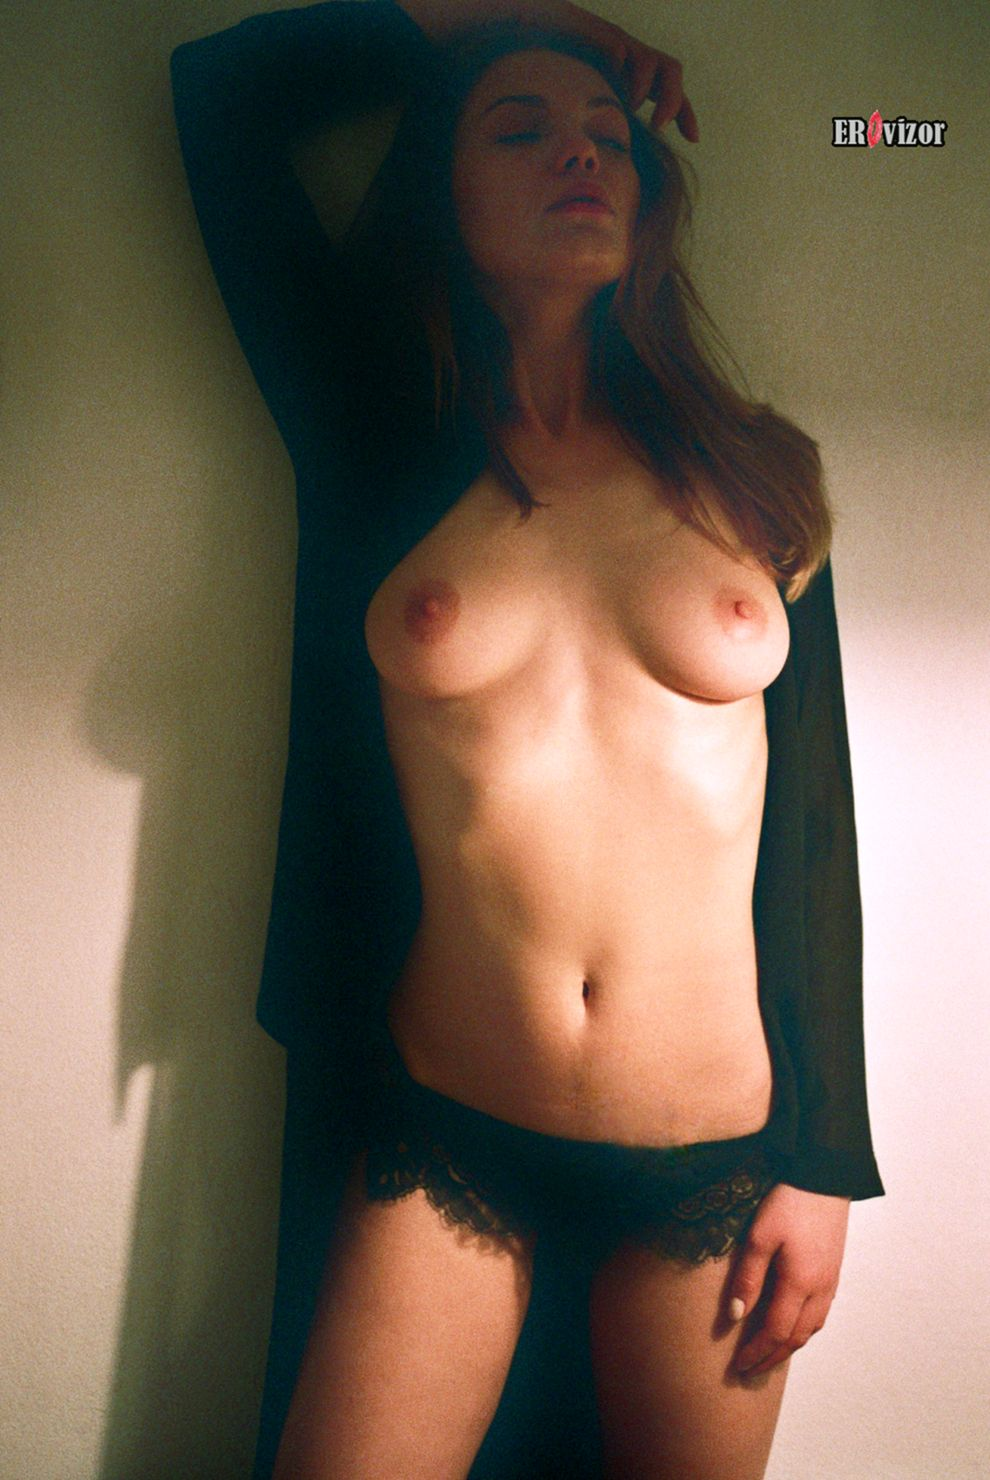 legkaya_erotica-erovizor (45)